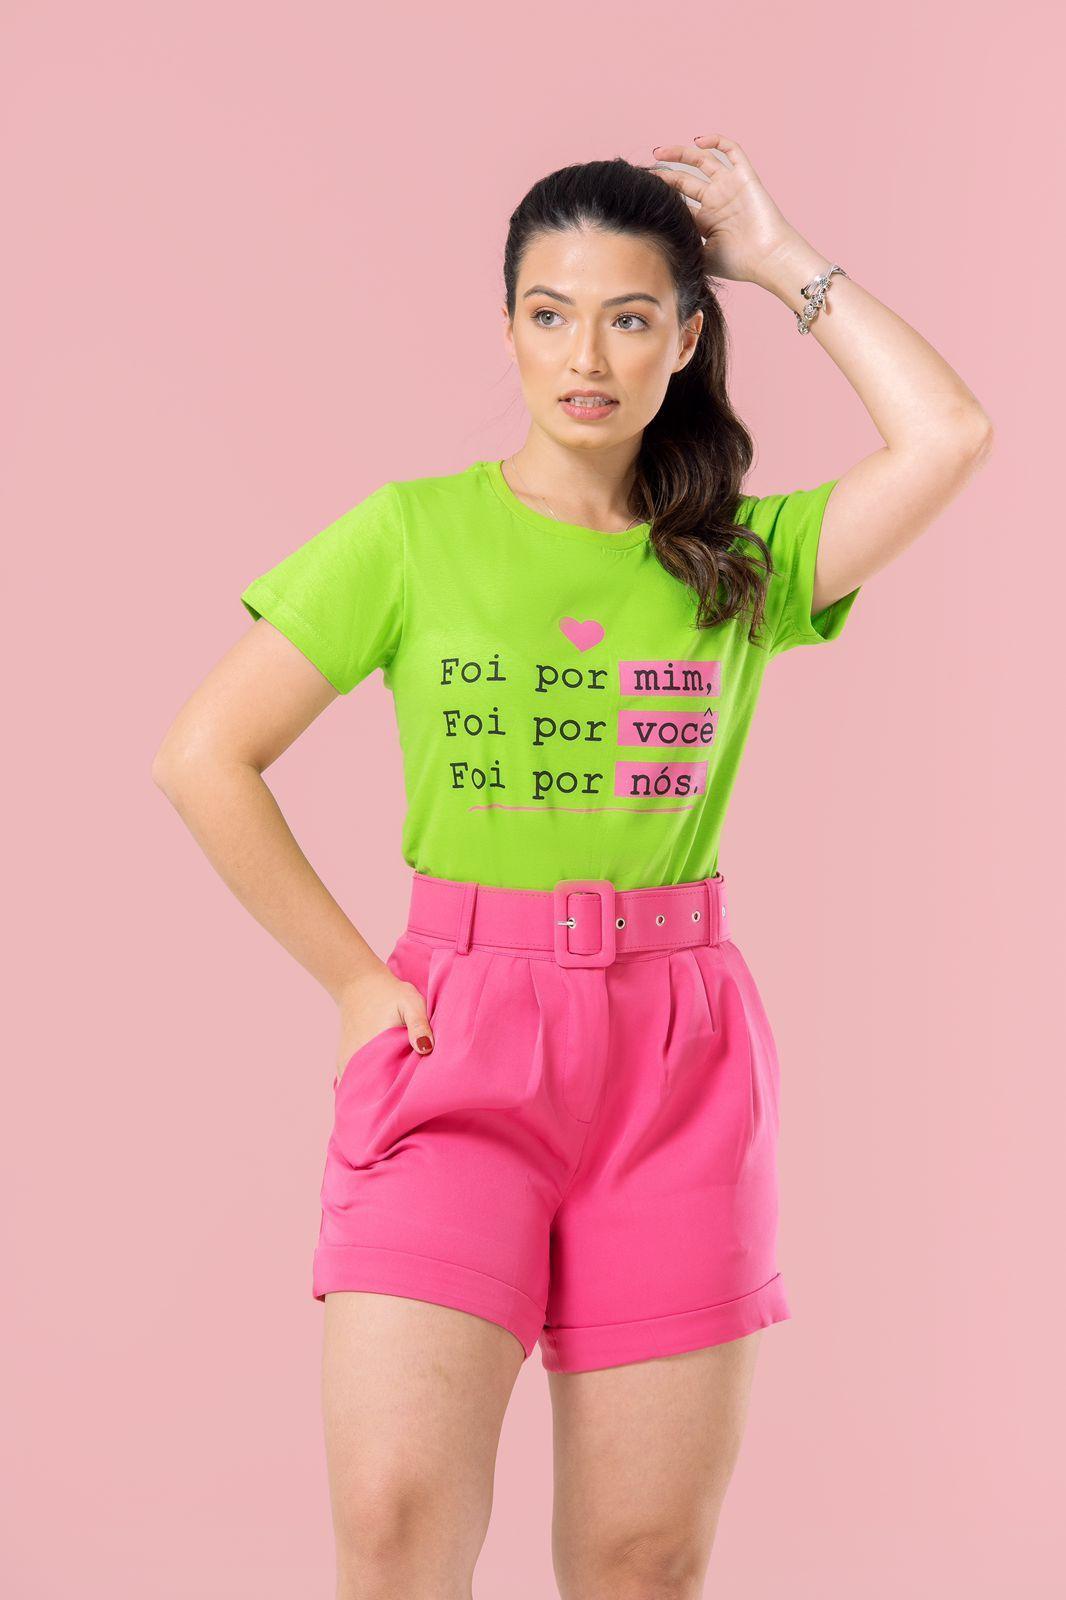 Diniz T-shirts feminina - Foi por mim